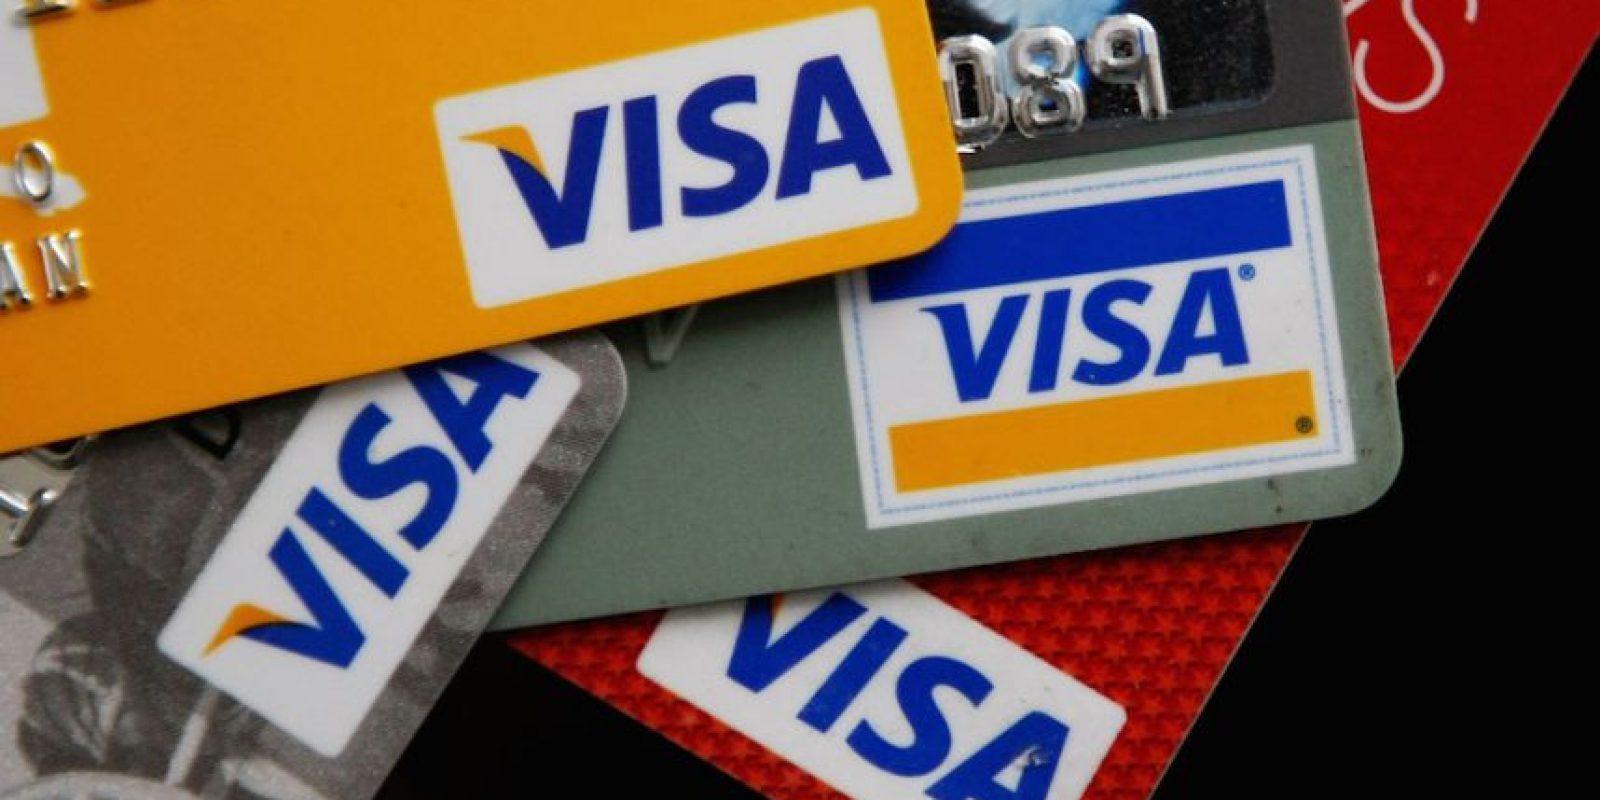 5) Visa – 92 mil millones de dólares. Foto:Getty Images